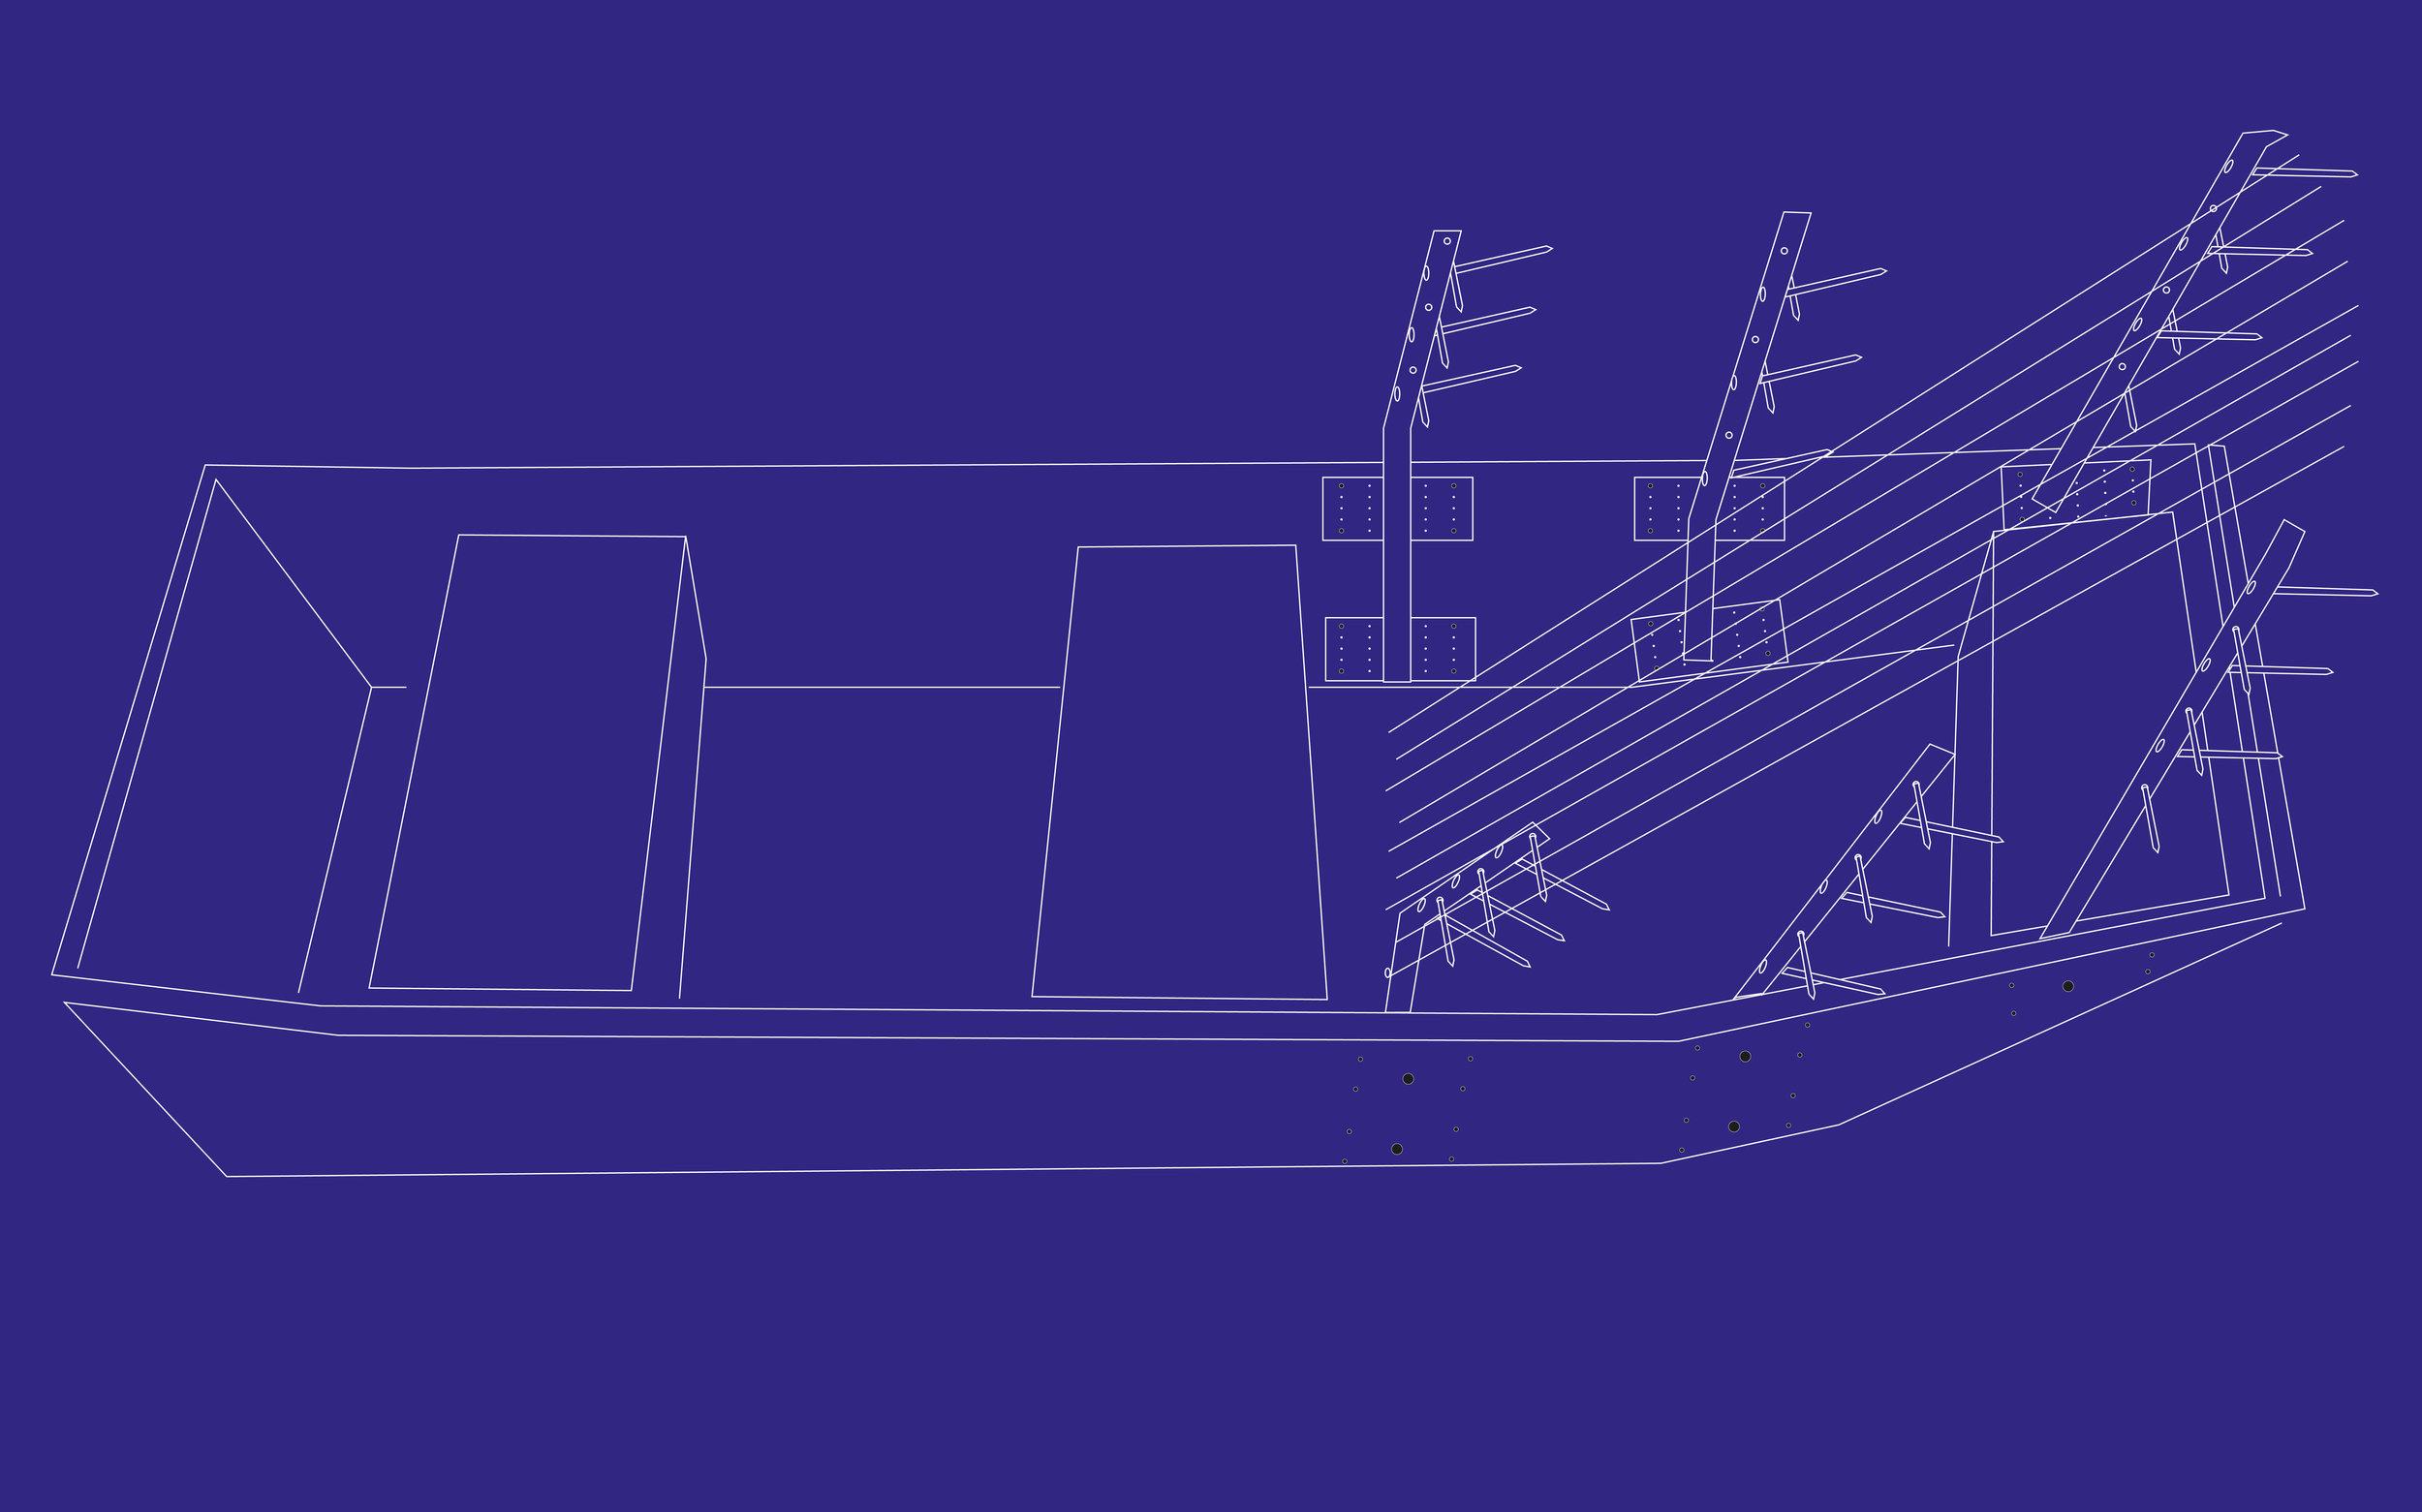 prototype_blueprint.jpg